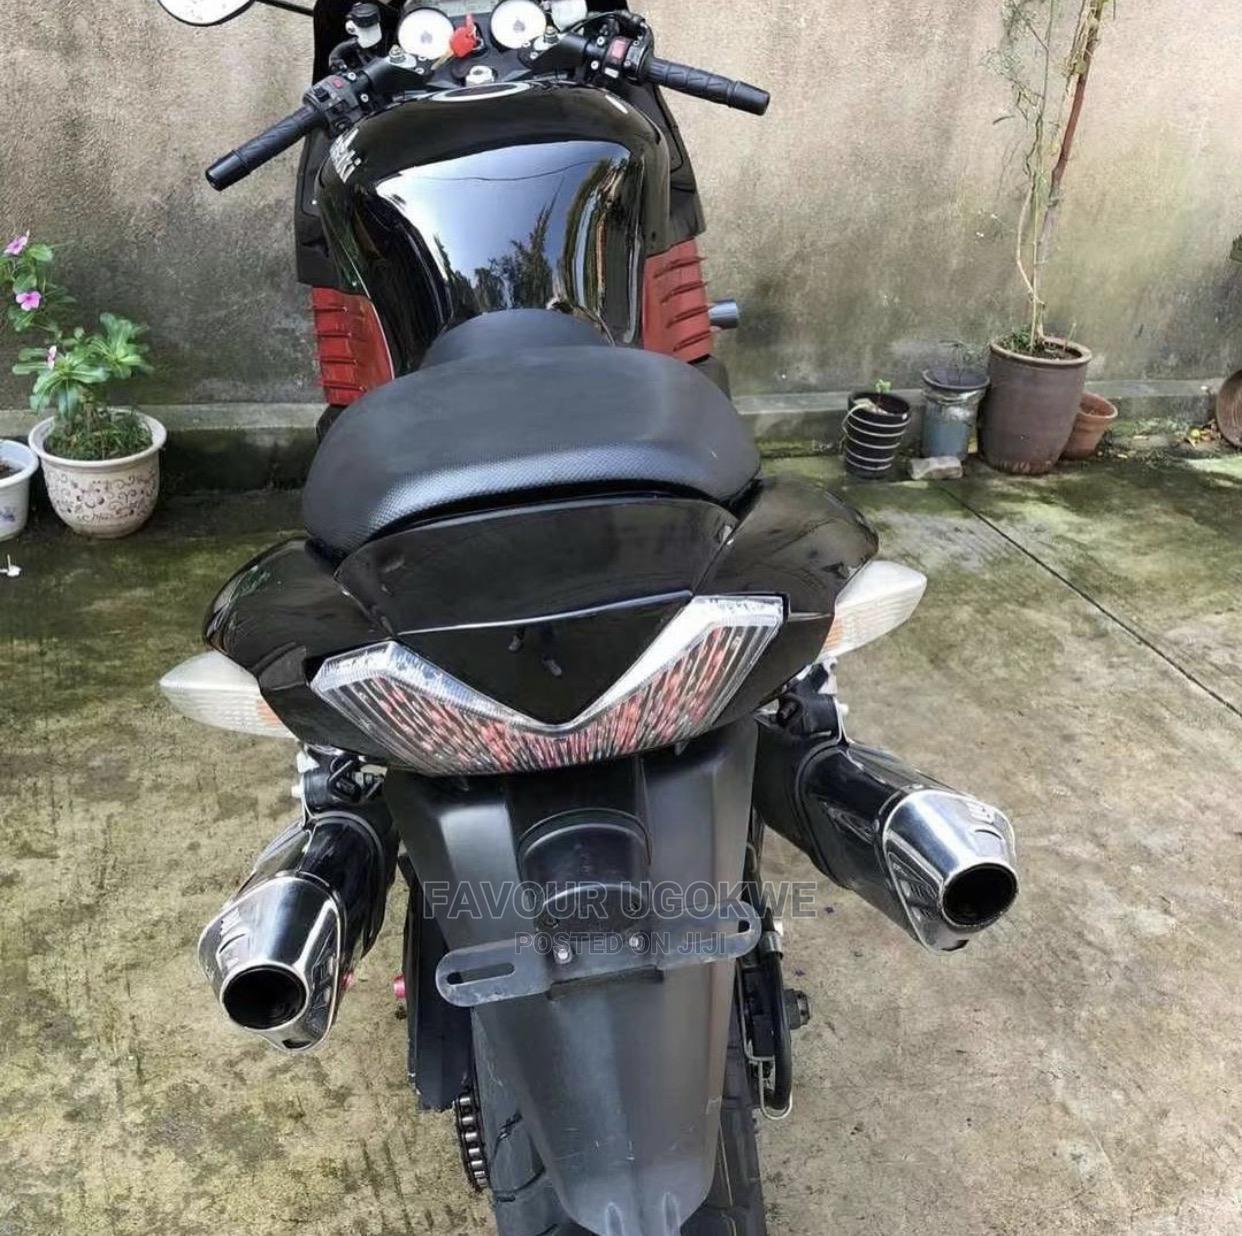 New Kawasaki Ninja ZX-14R 2016 Black | Motorcycles & Scooters for sale in Lagos Island (Eko), Lagos State, Nigeria